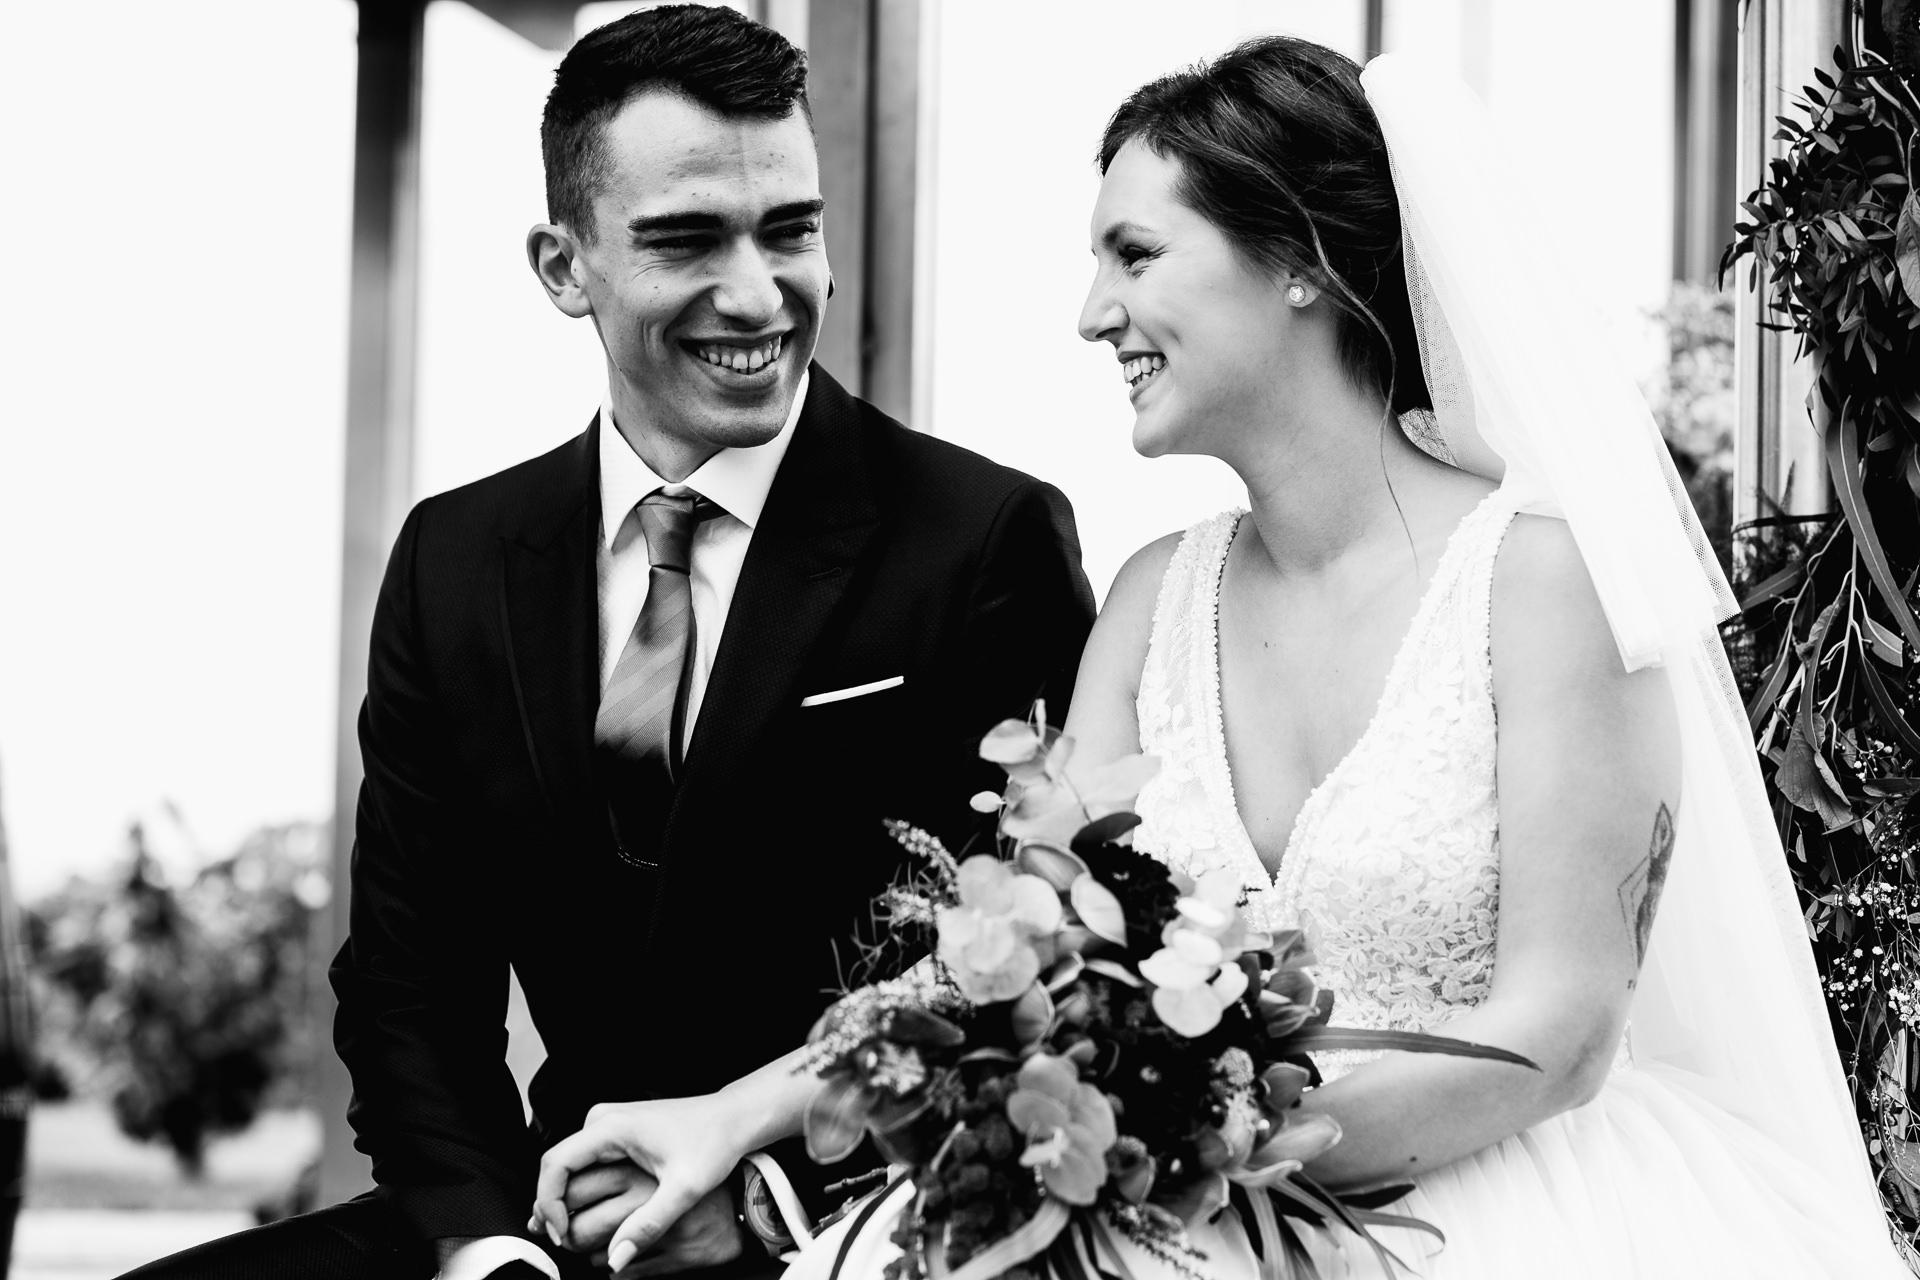 boda civil eguren ugarte larioja 140000